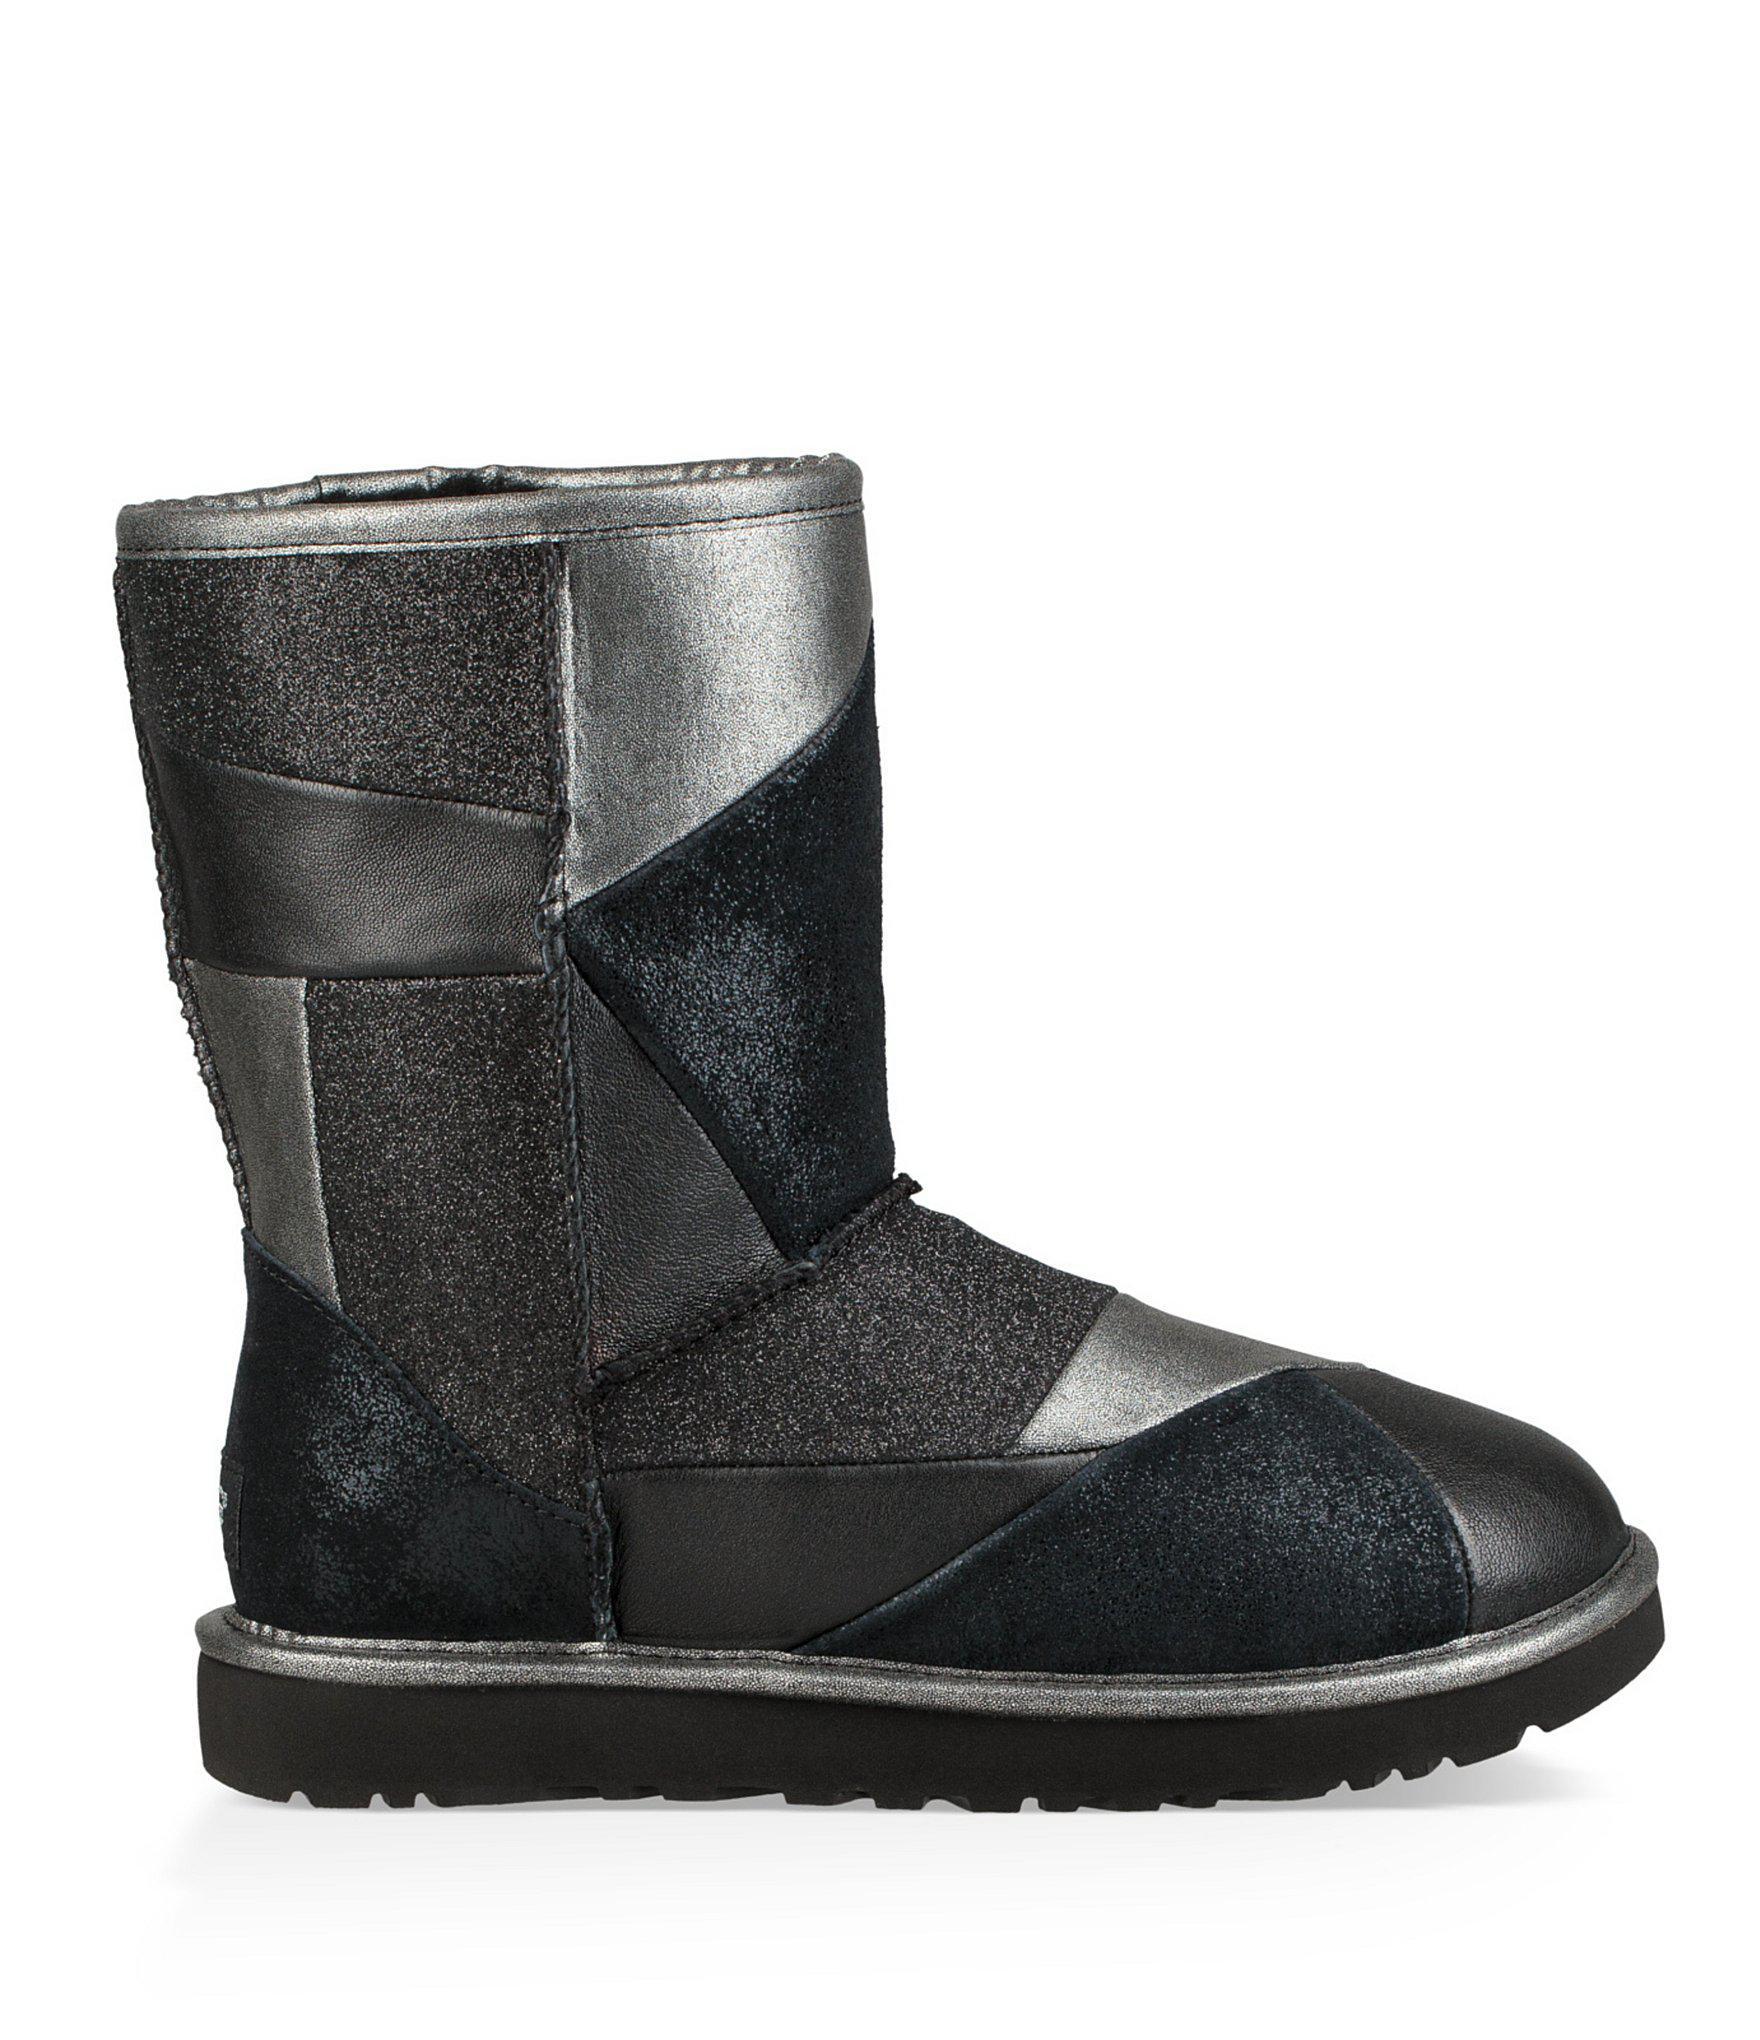 e7429ff91d6 Ugg Black Classic Glitter Patchwork Boots